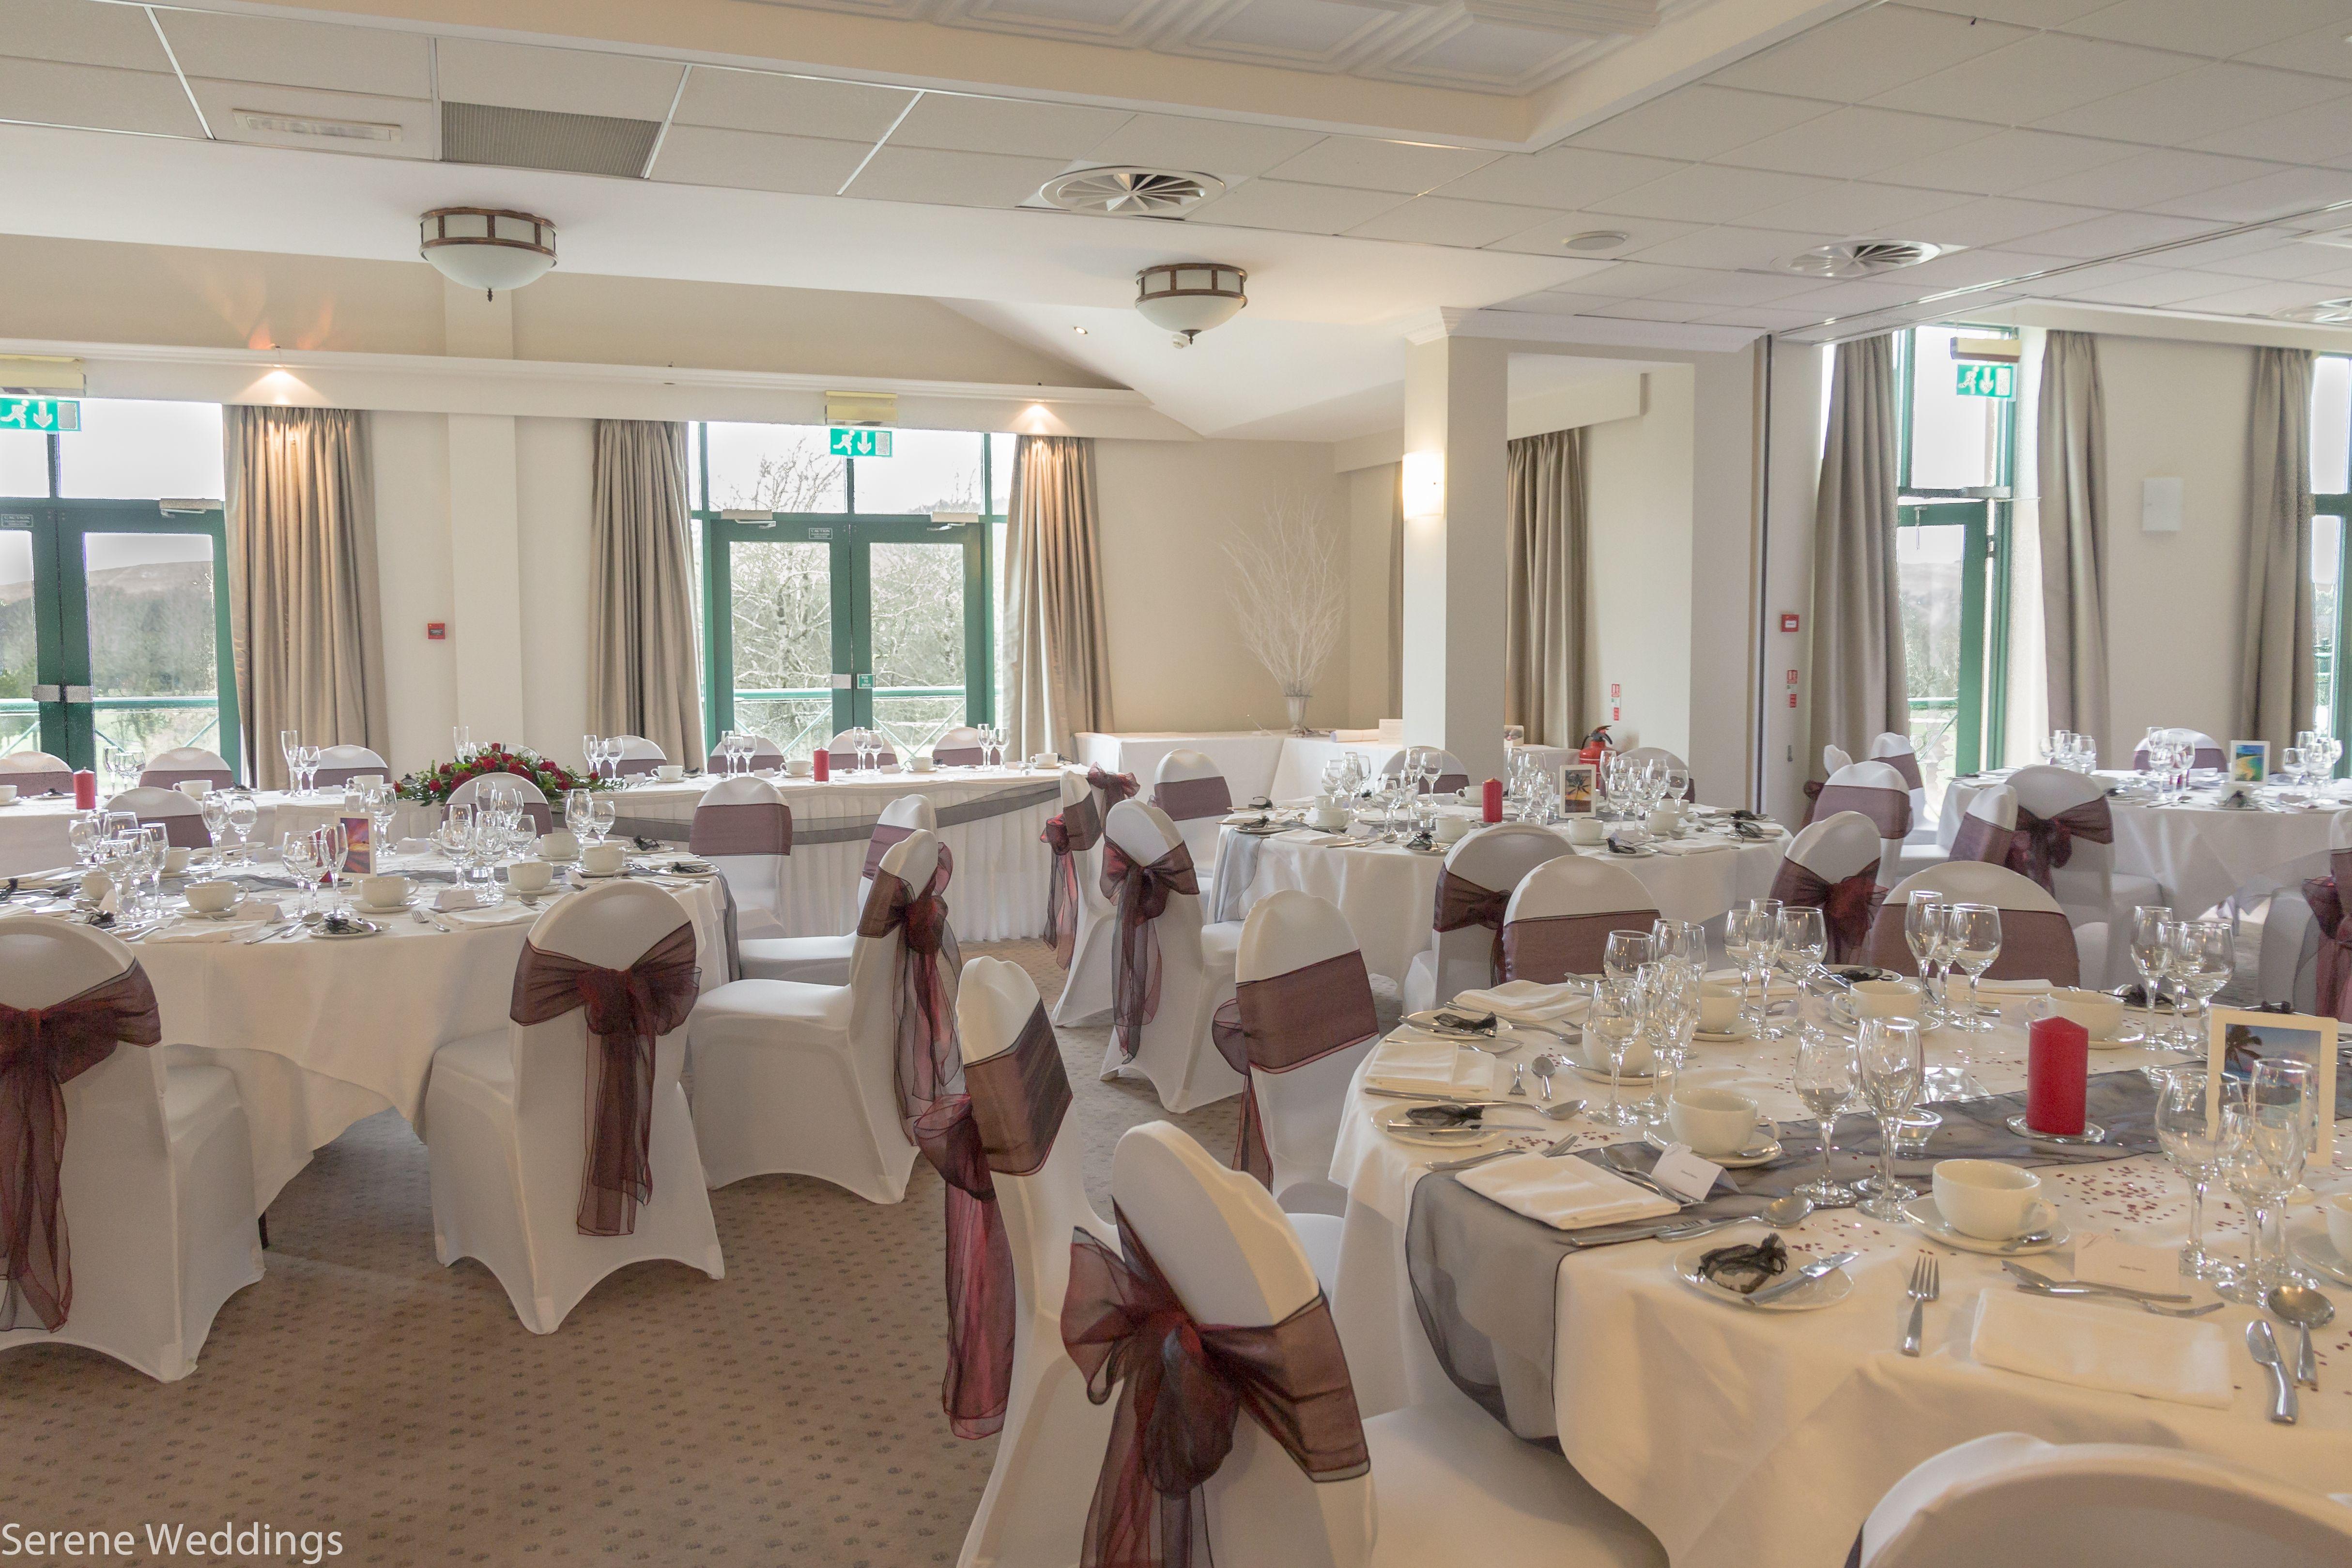 Morgannwg Suite httpwwwvale hotelcomWeddingsFunction Rooms Wedding Reception